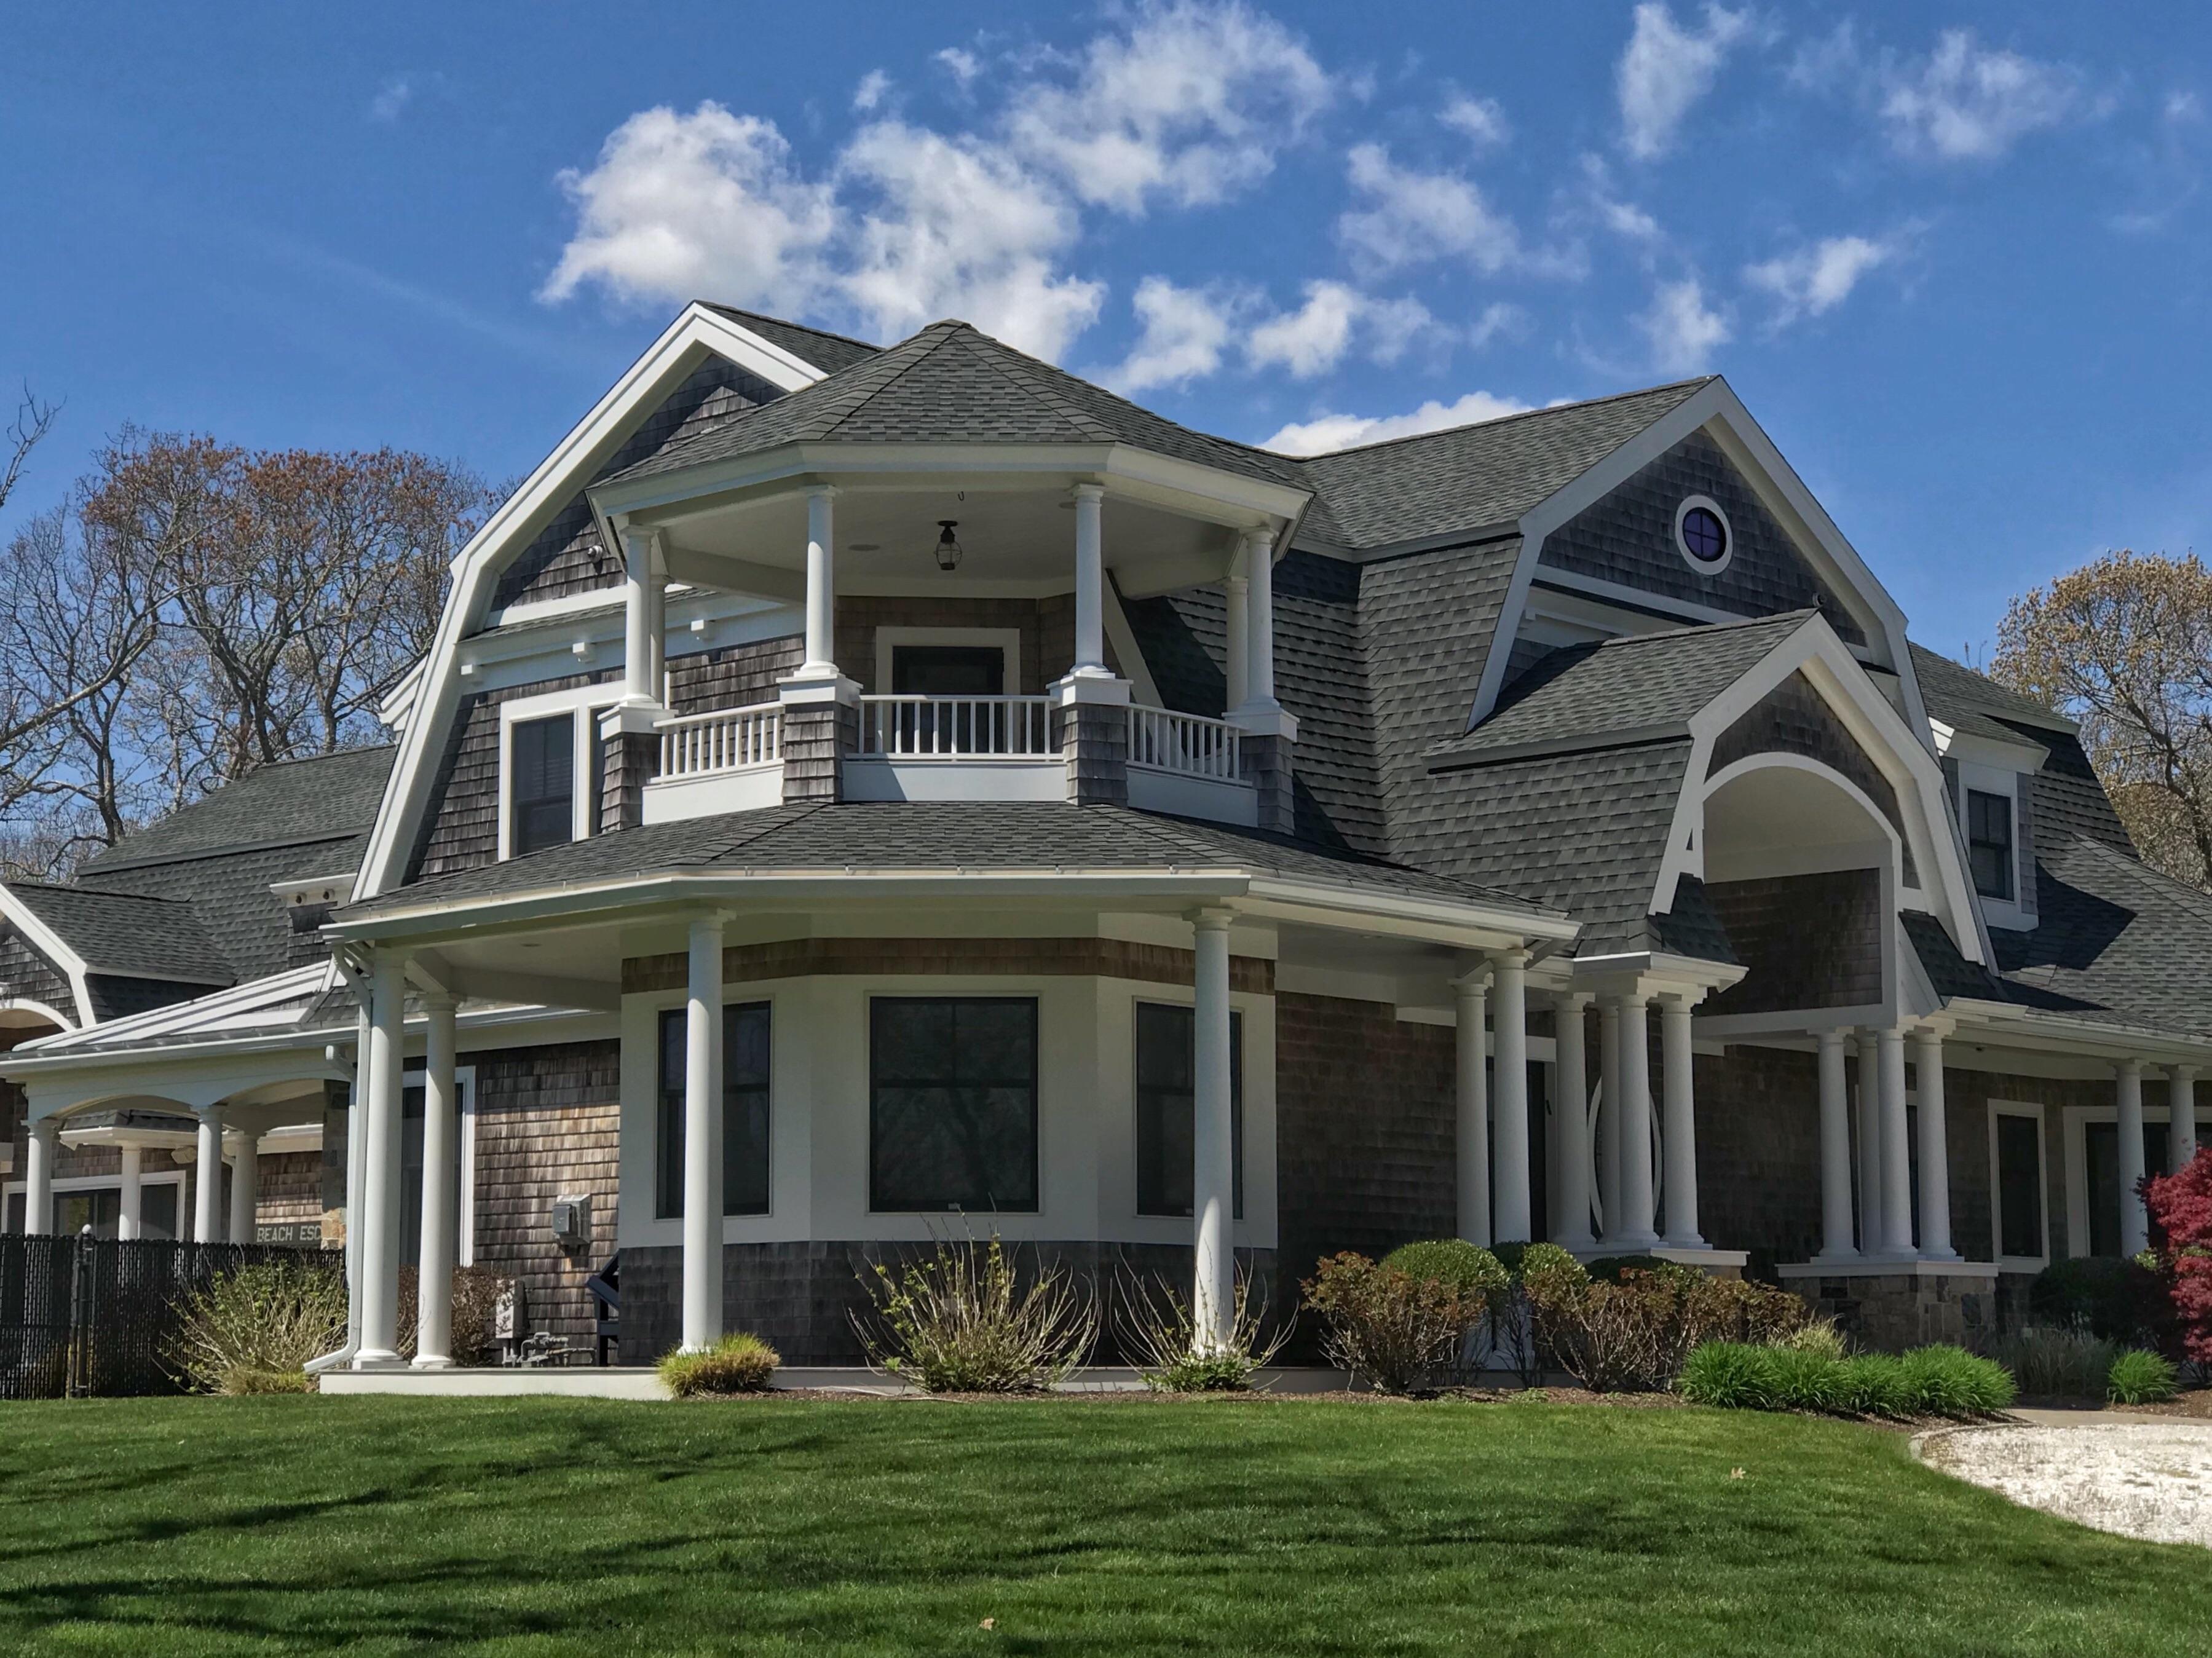 Cape Cod House In Falmouth 3598x2697 Oc Houseporn